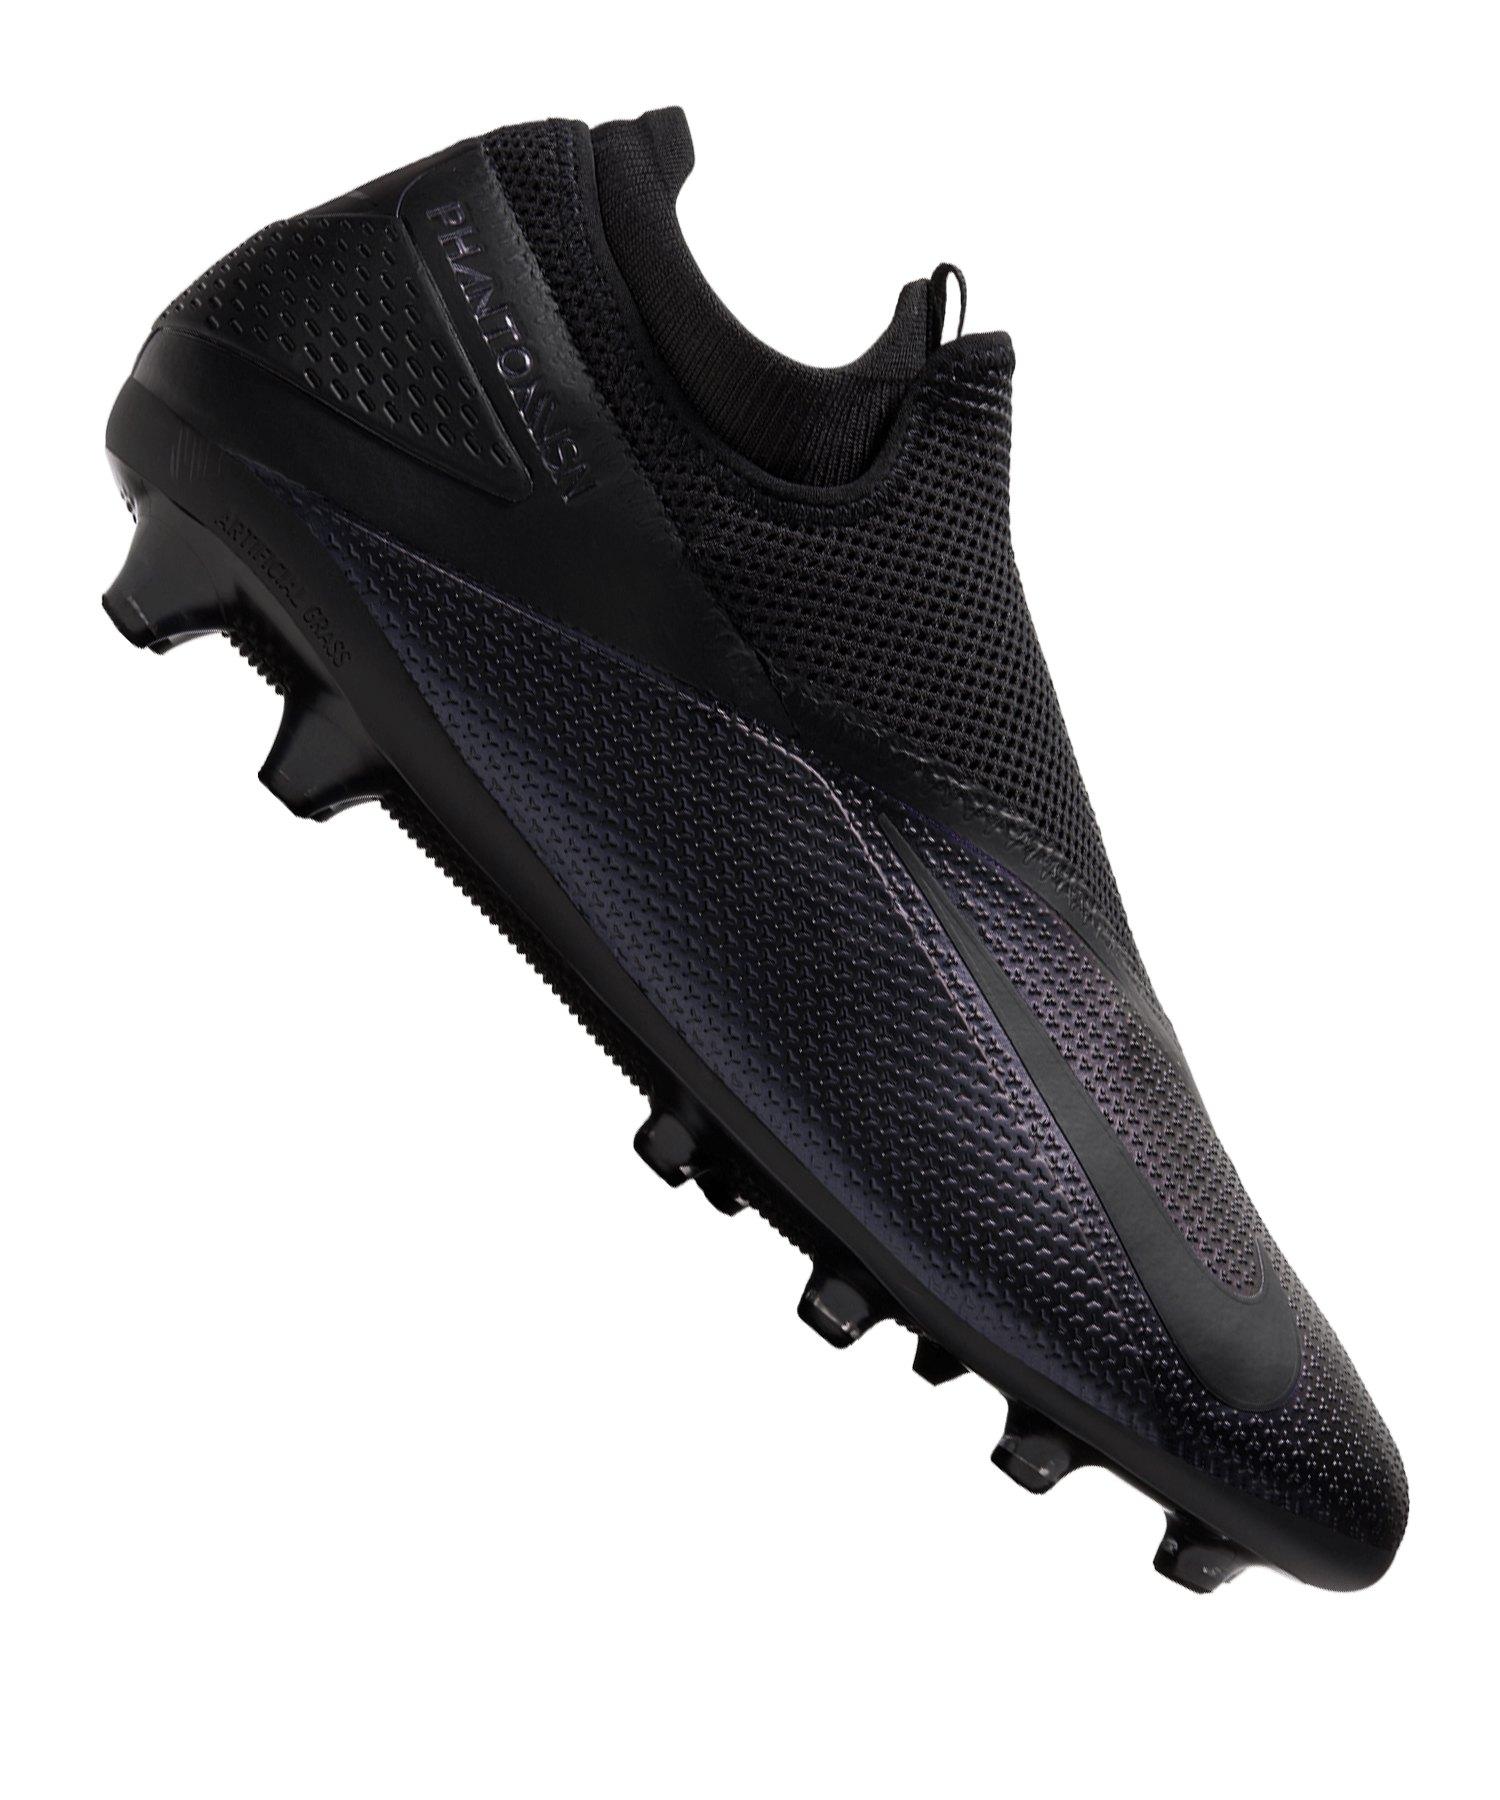 Nike Phantom Vision II Kinetic Black Pro DF AG-Pro Schwarz F010 - schwarz